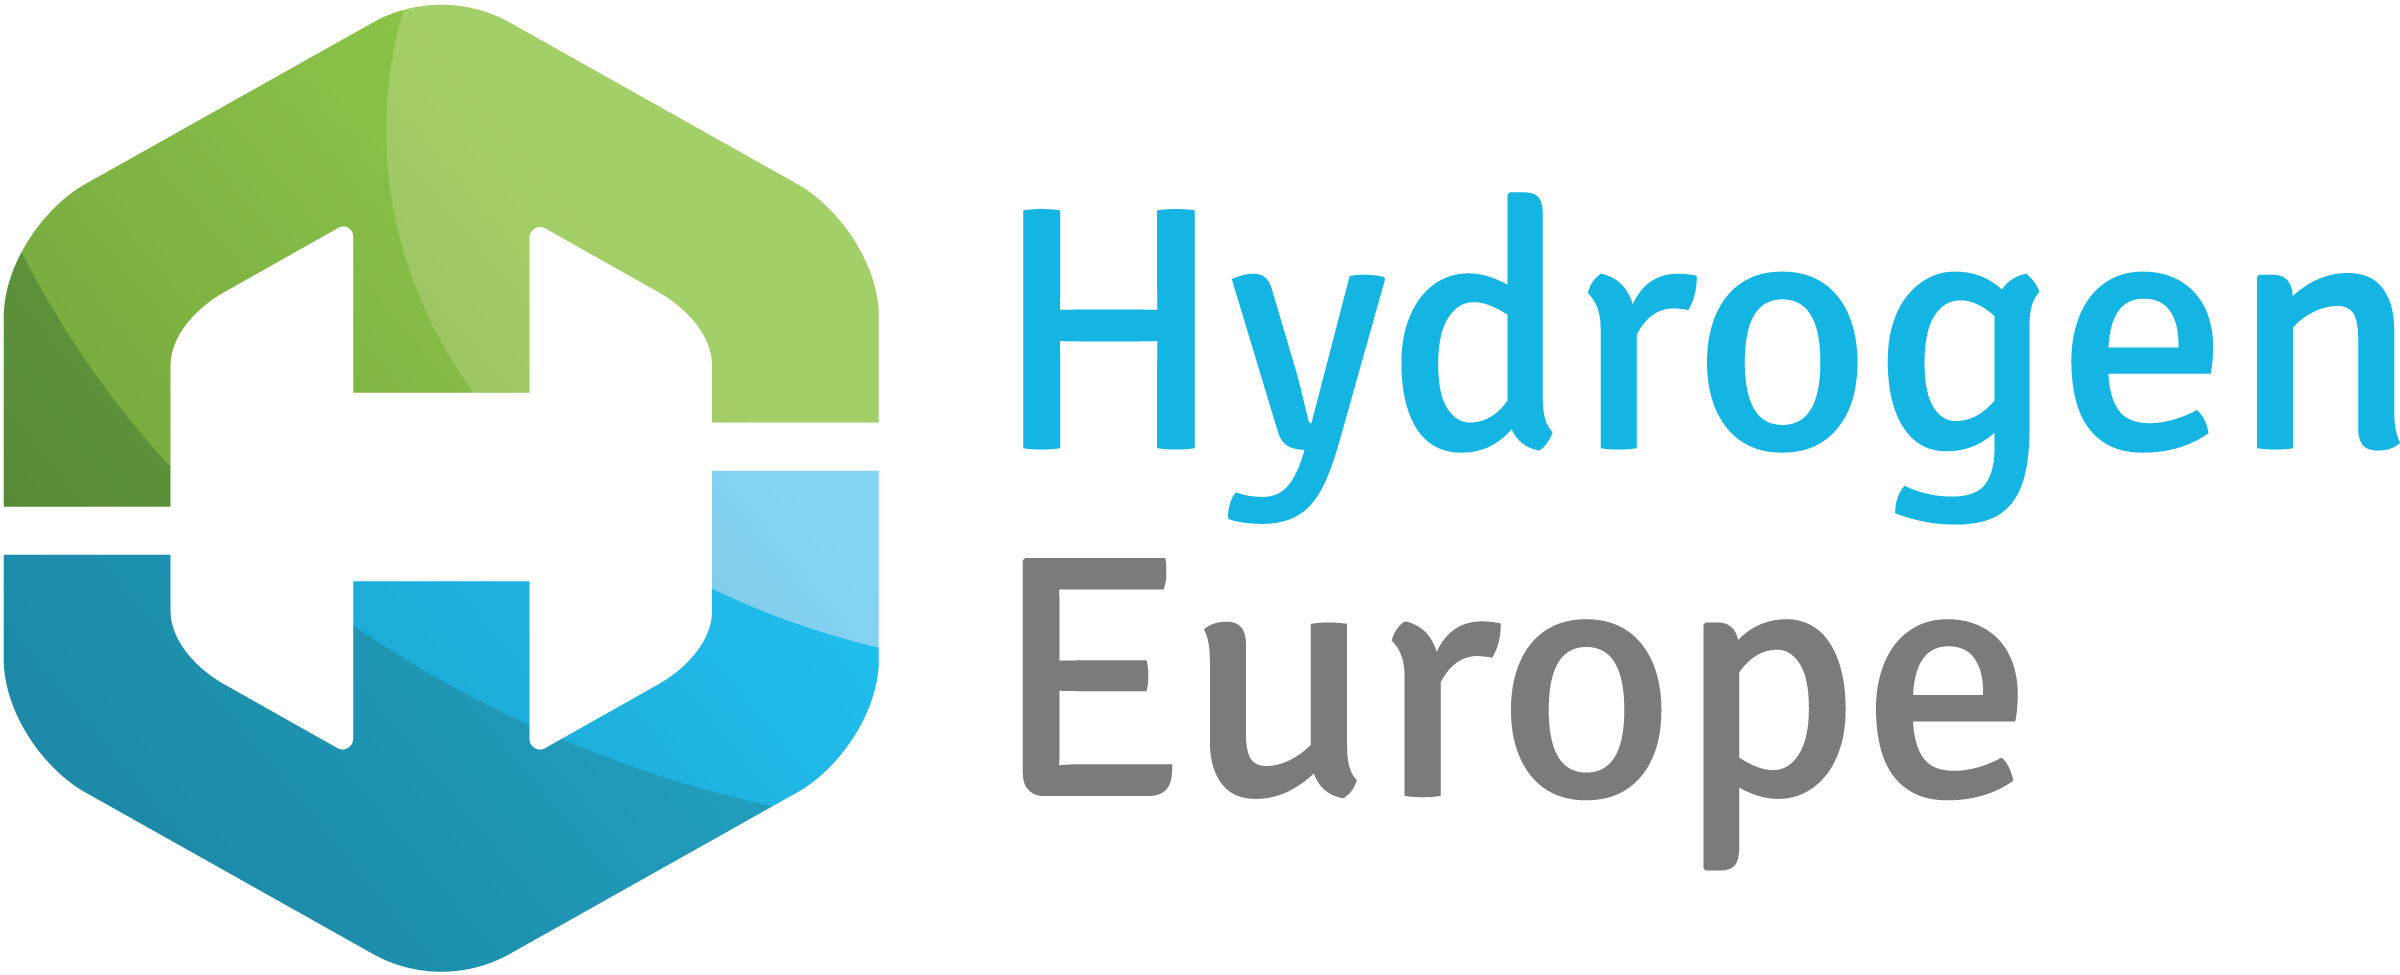 Hydrogen Europe logo